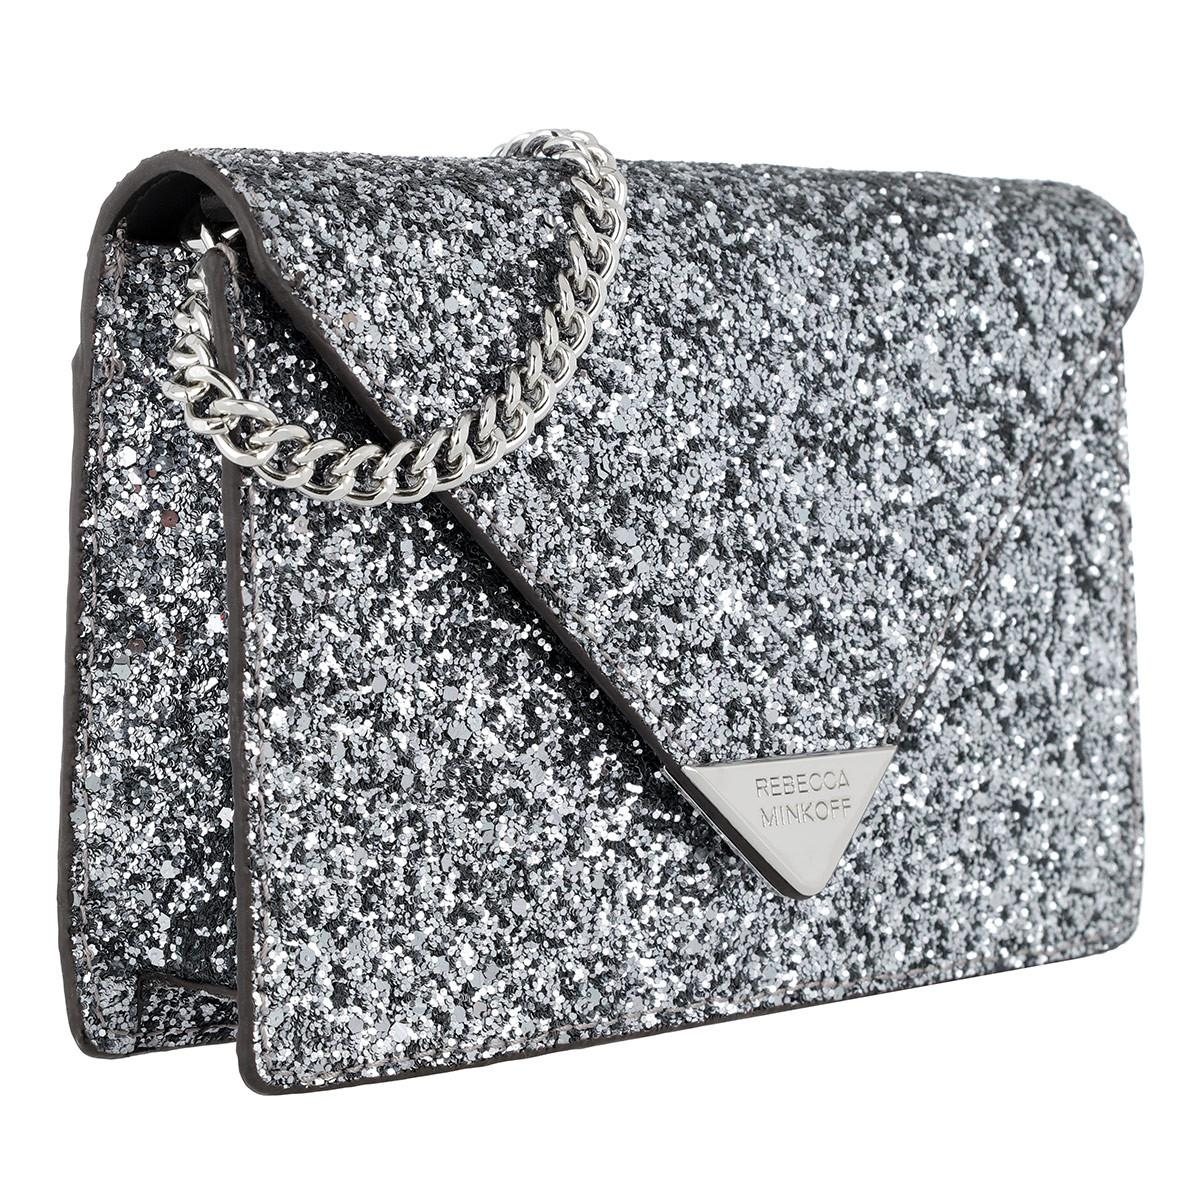 Rebecca Minkoff Leather Molly Crossbody Silver in Metallic